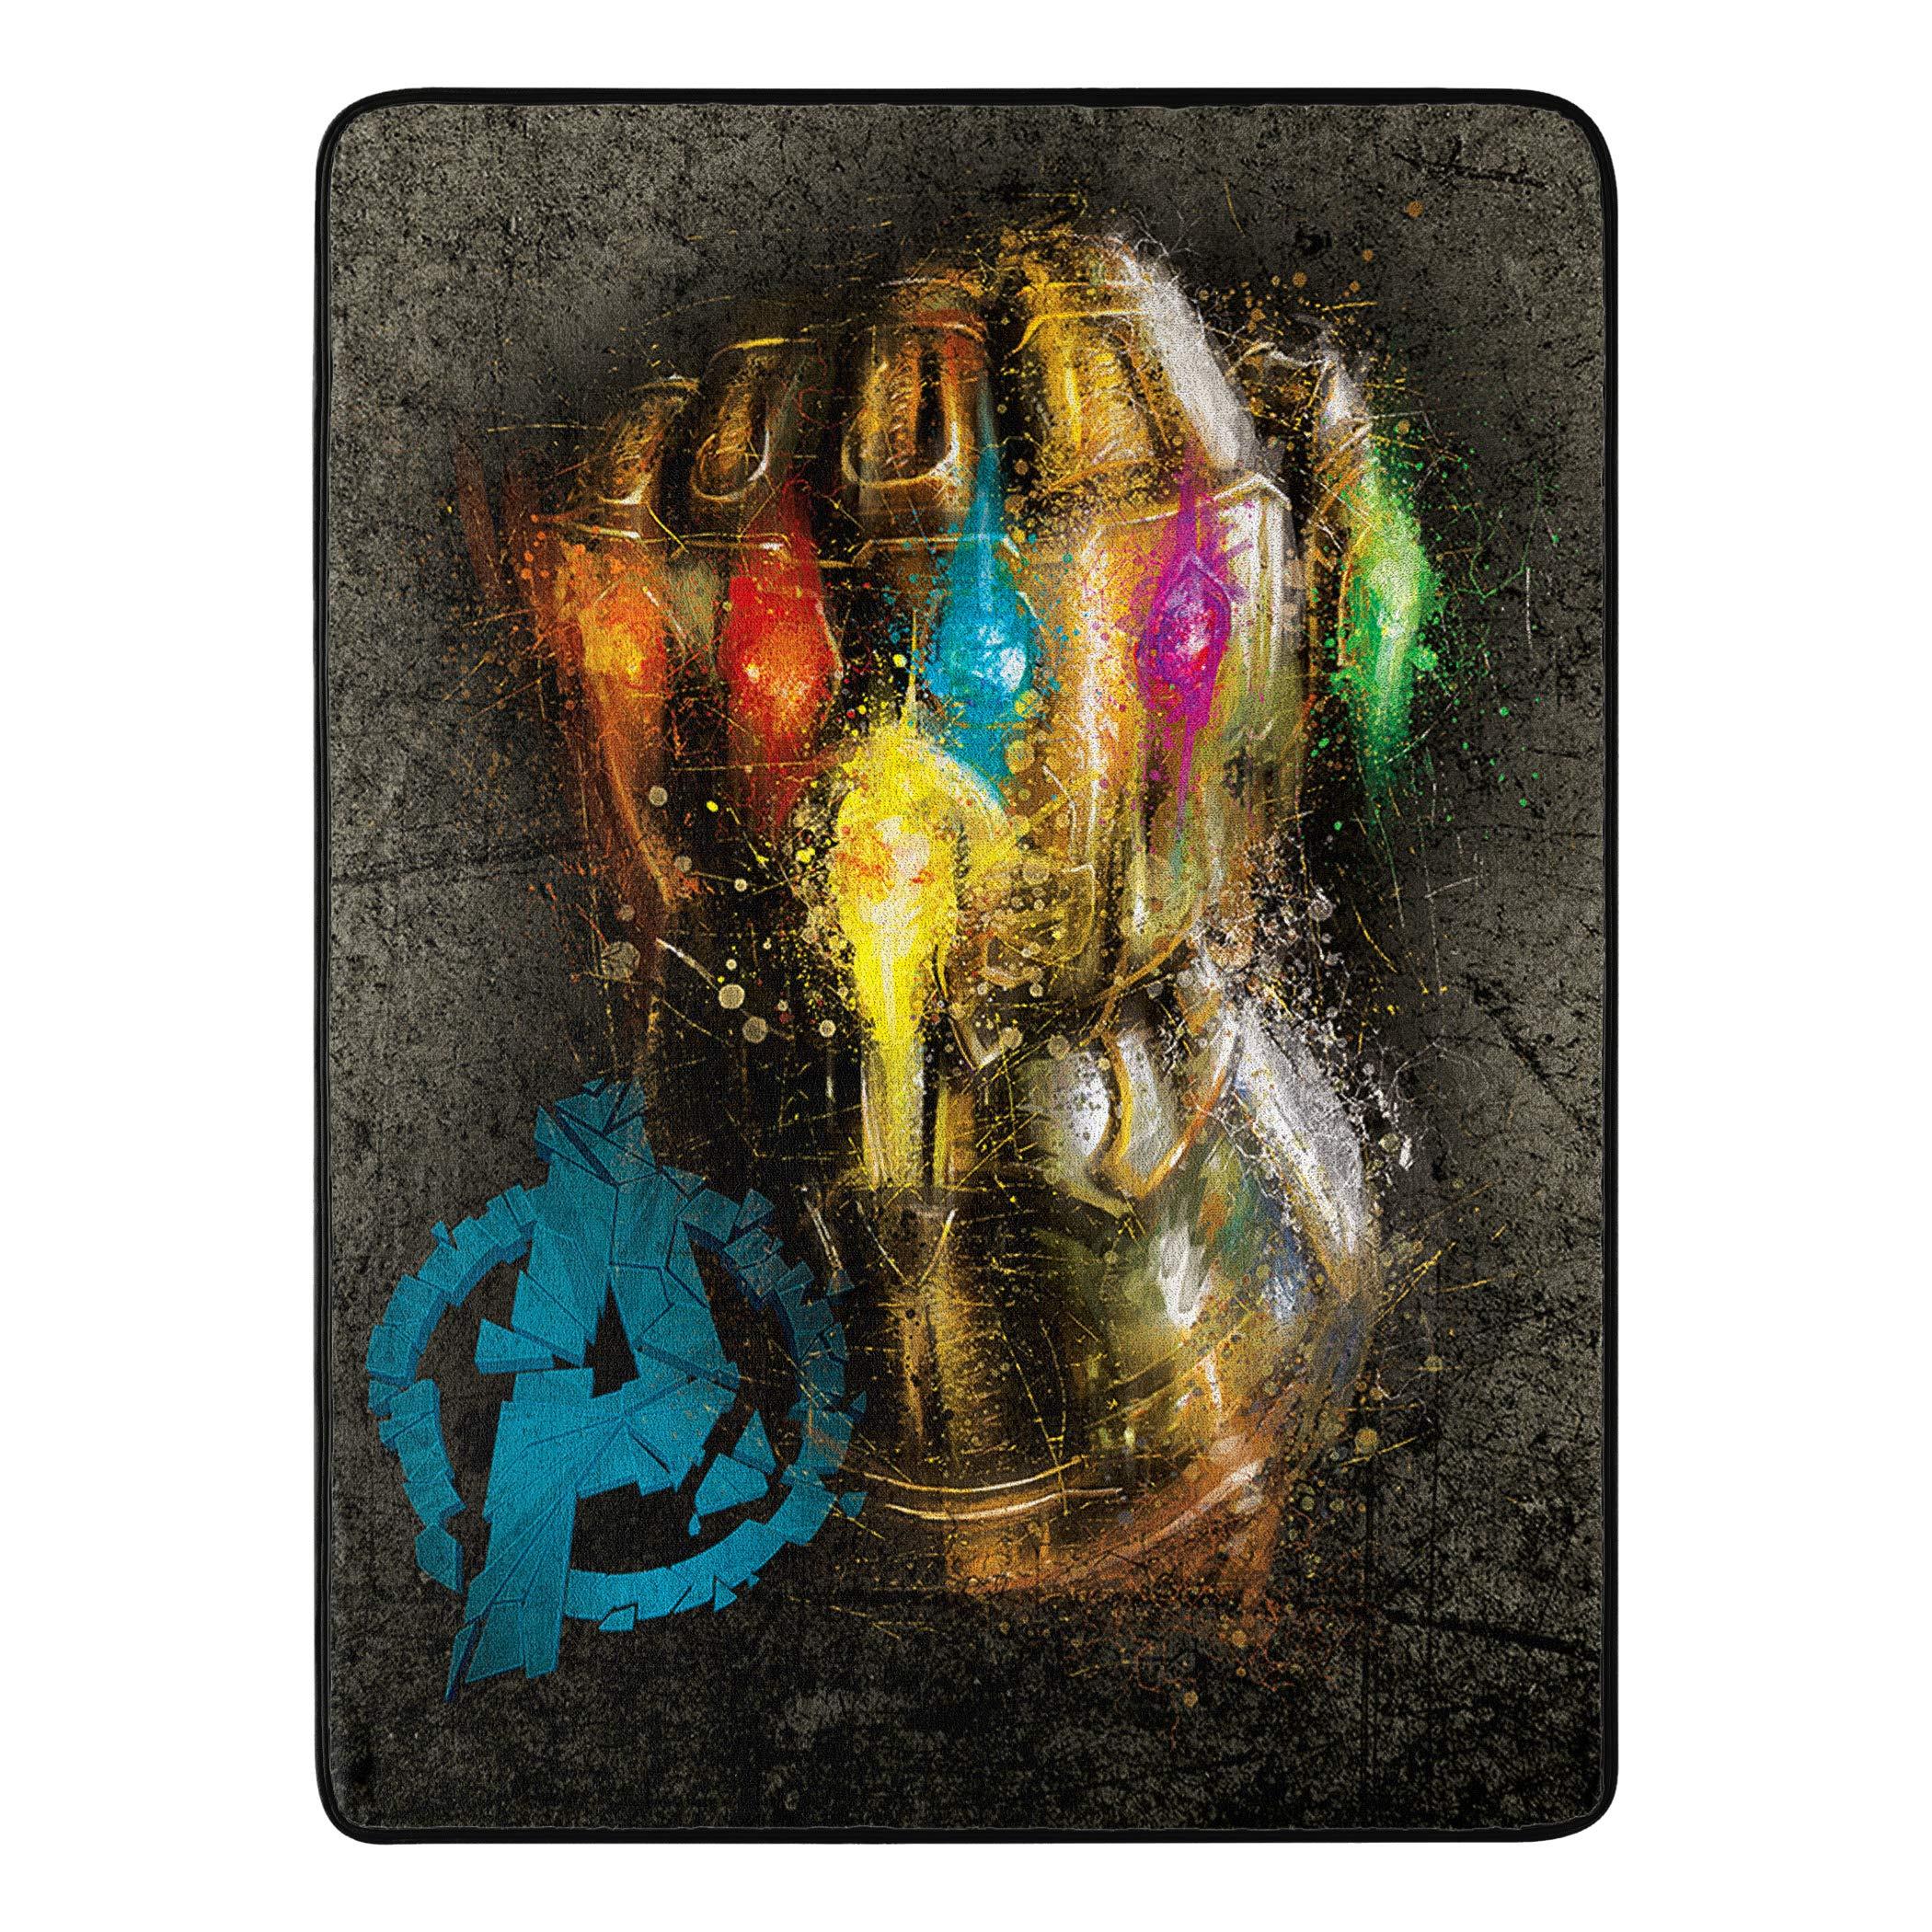 Marvel's Avengers Endgame, ''Gauntlet'' Micro Raschel Throw Blanket, 46'' x 60'', Multi Color